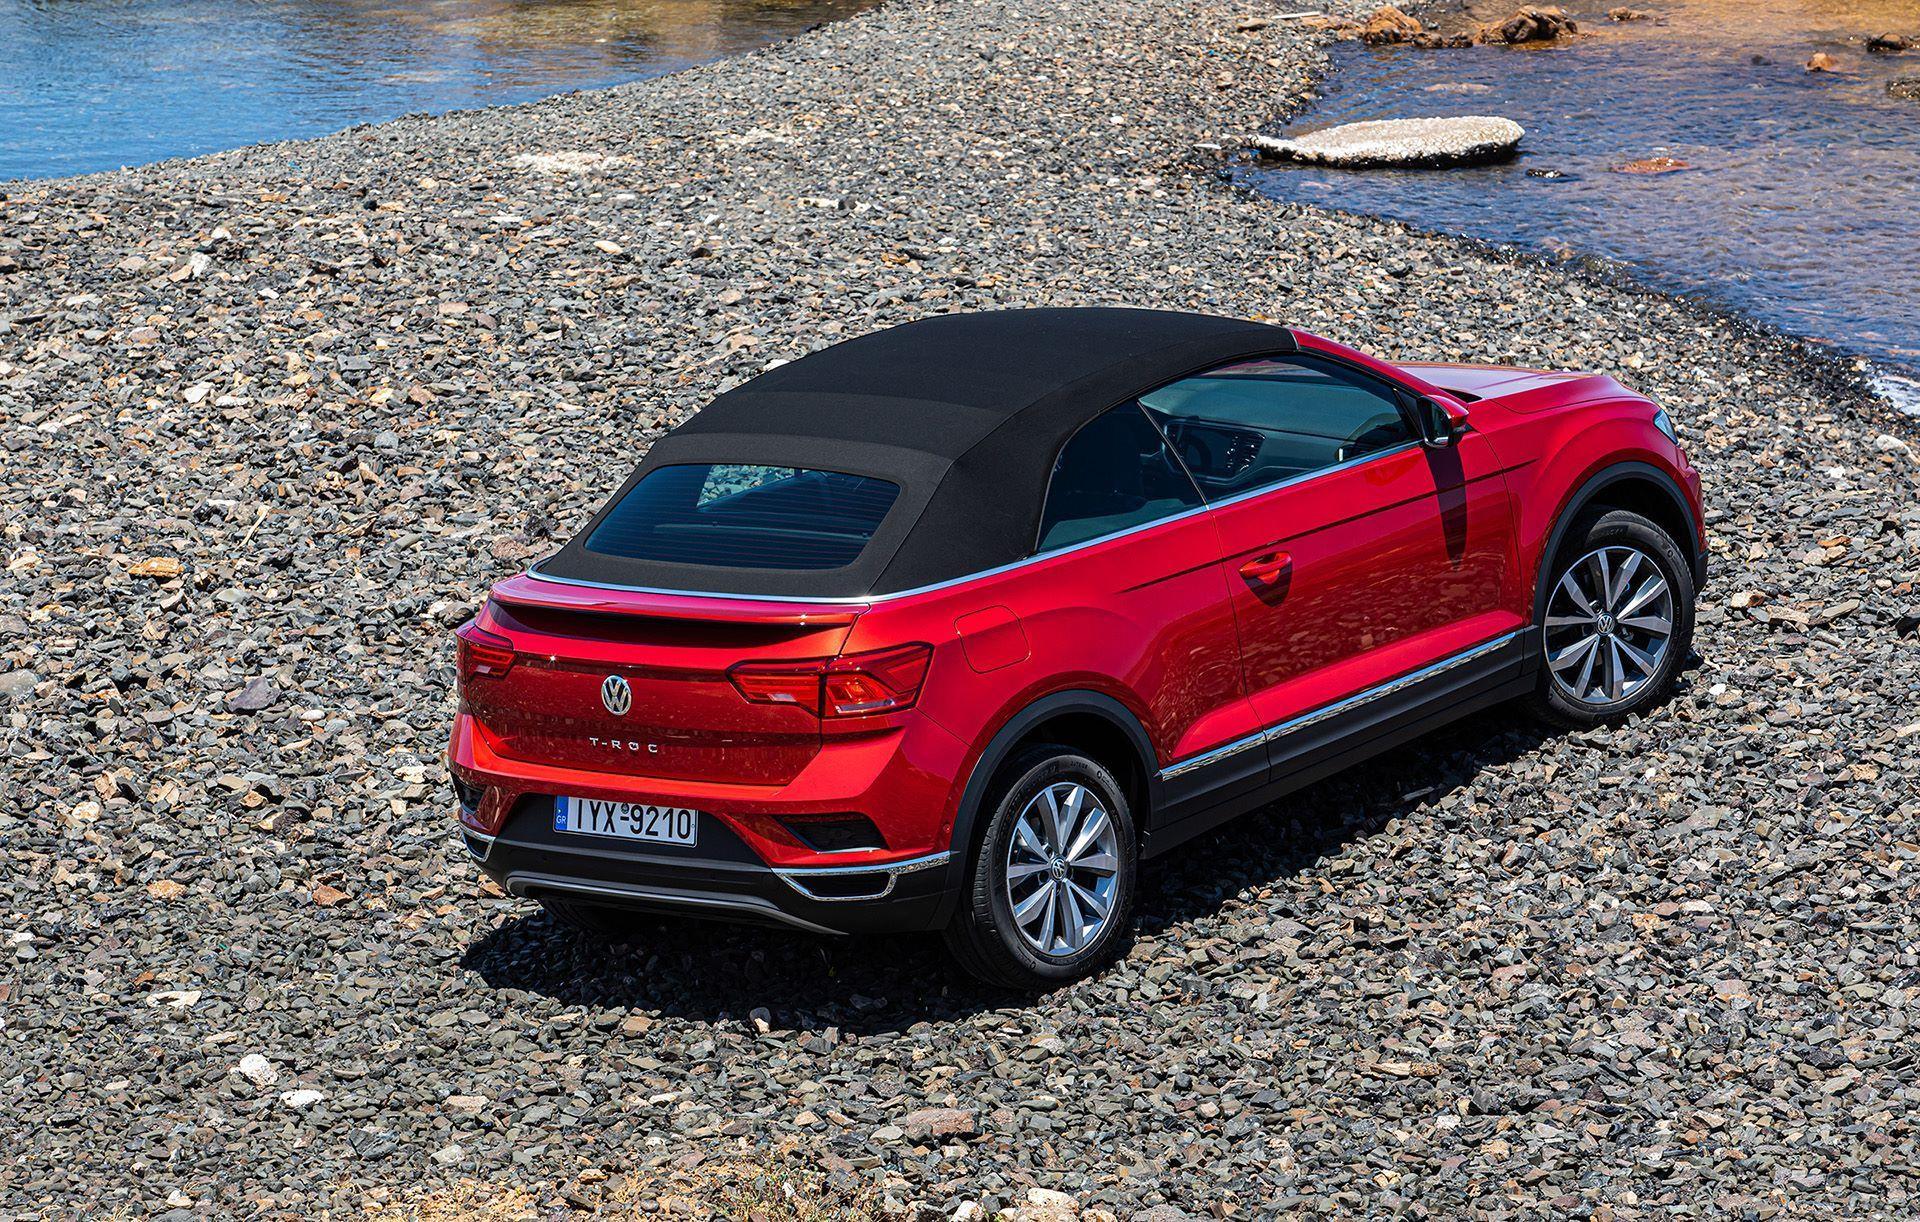 Volkswagen-T-Roc-Cabriolet-Greece-4